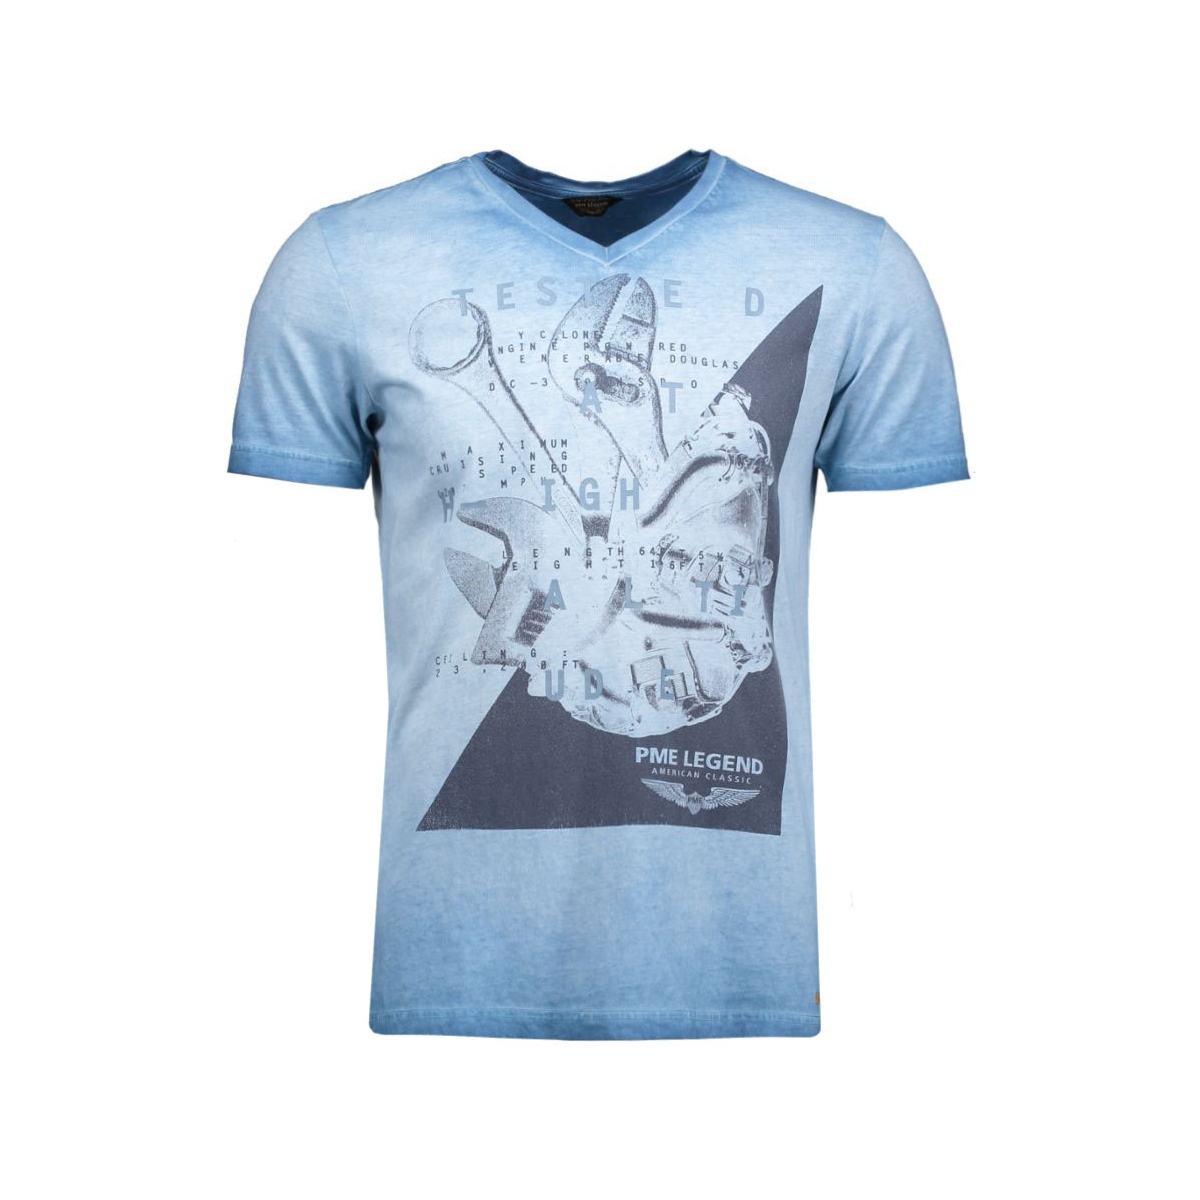 ptss63512 pme legend t-shirt 5190